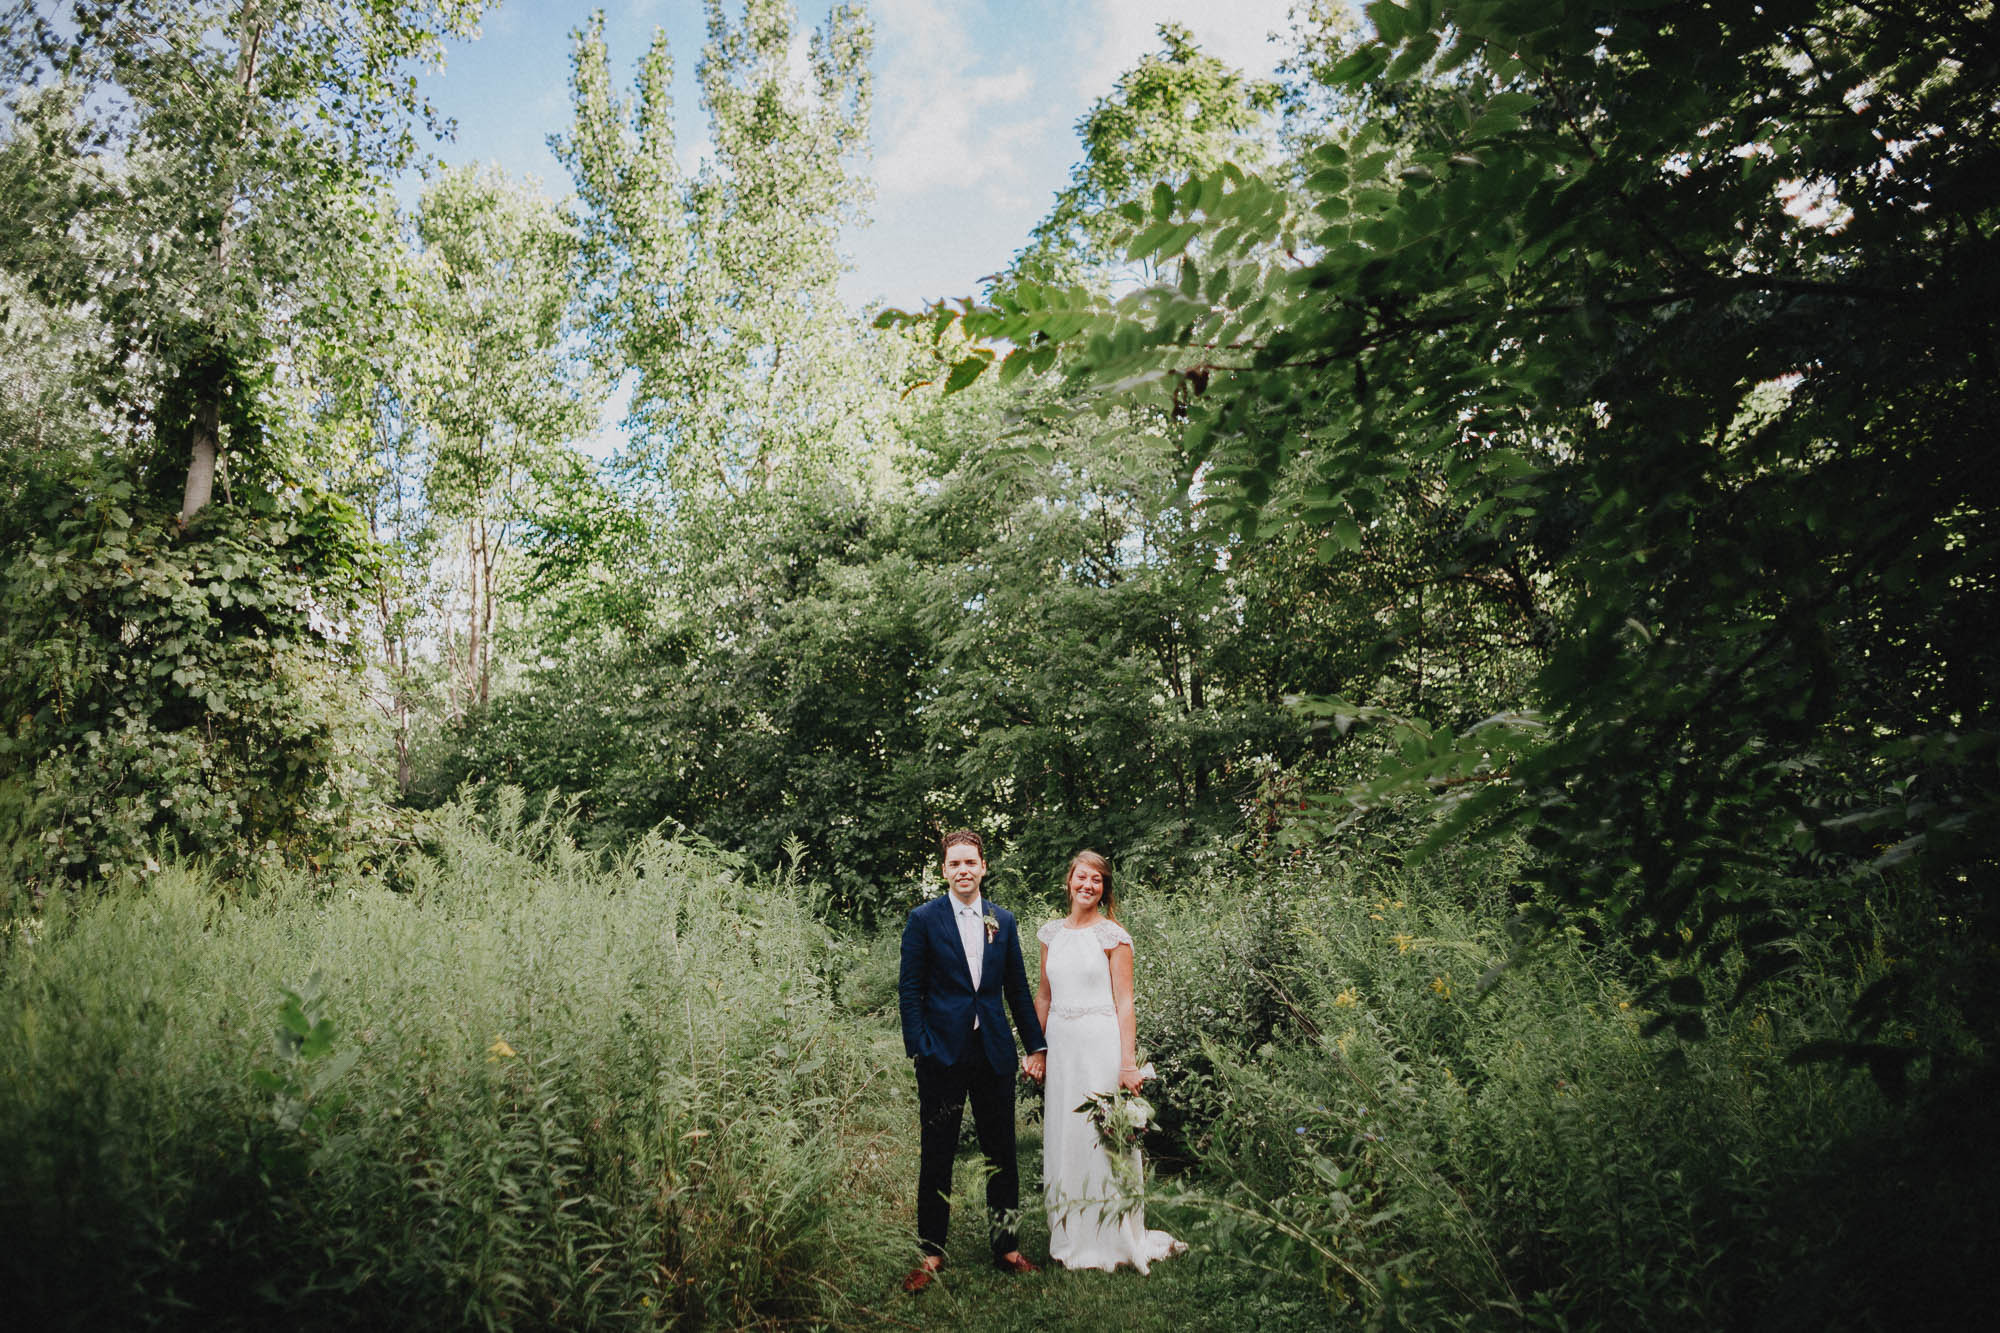 Leah-Graham-Michigan-Outdoor-DIY-Wedding-083@2x.jpg